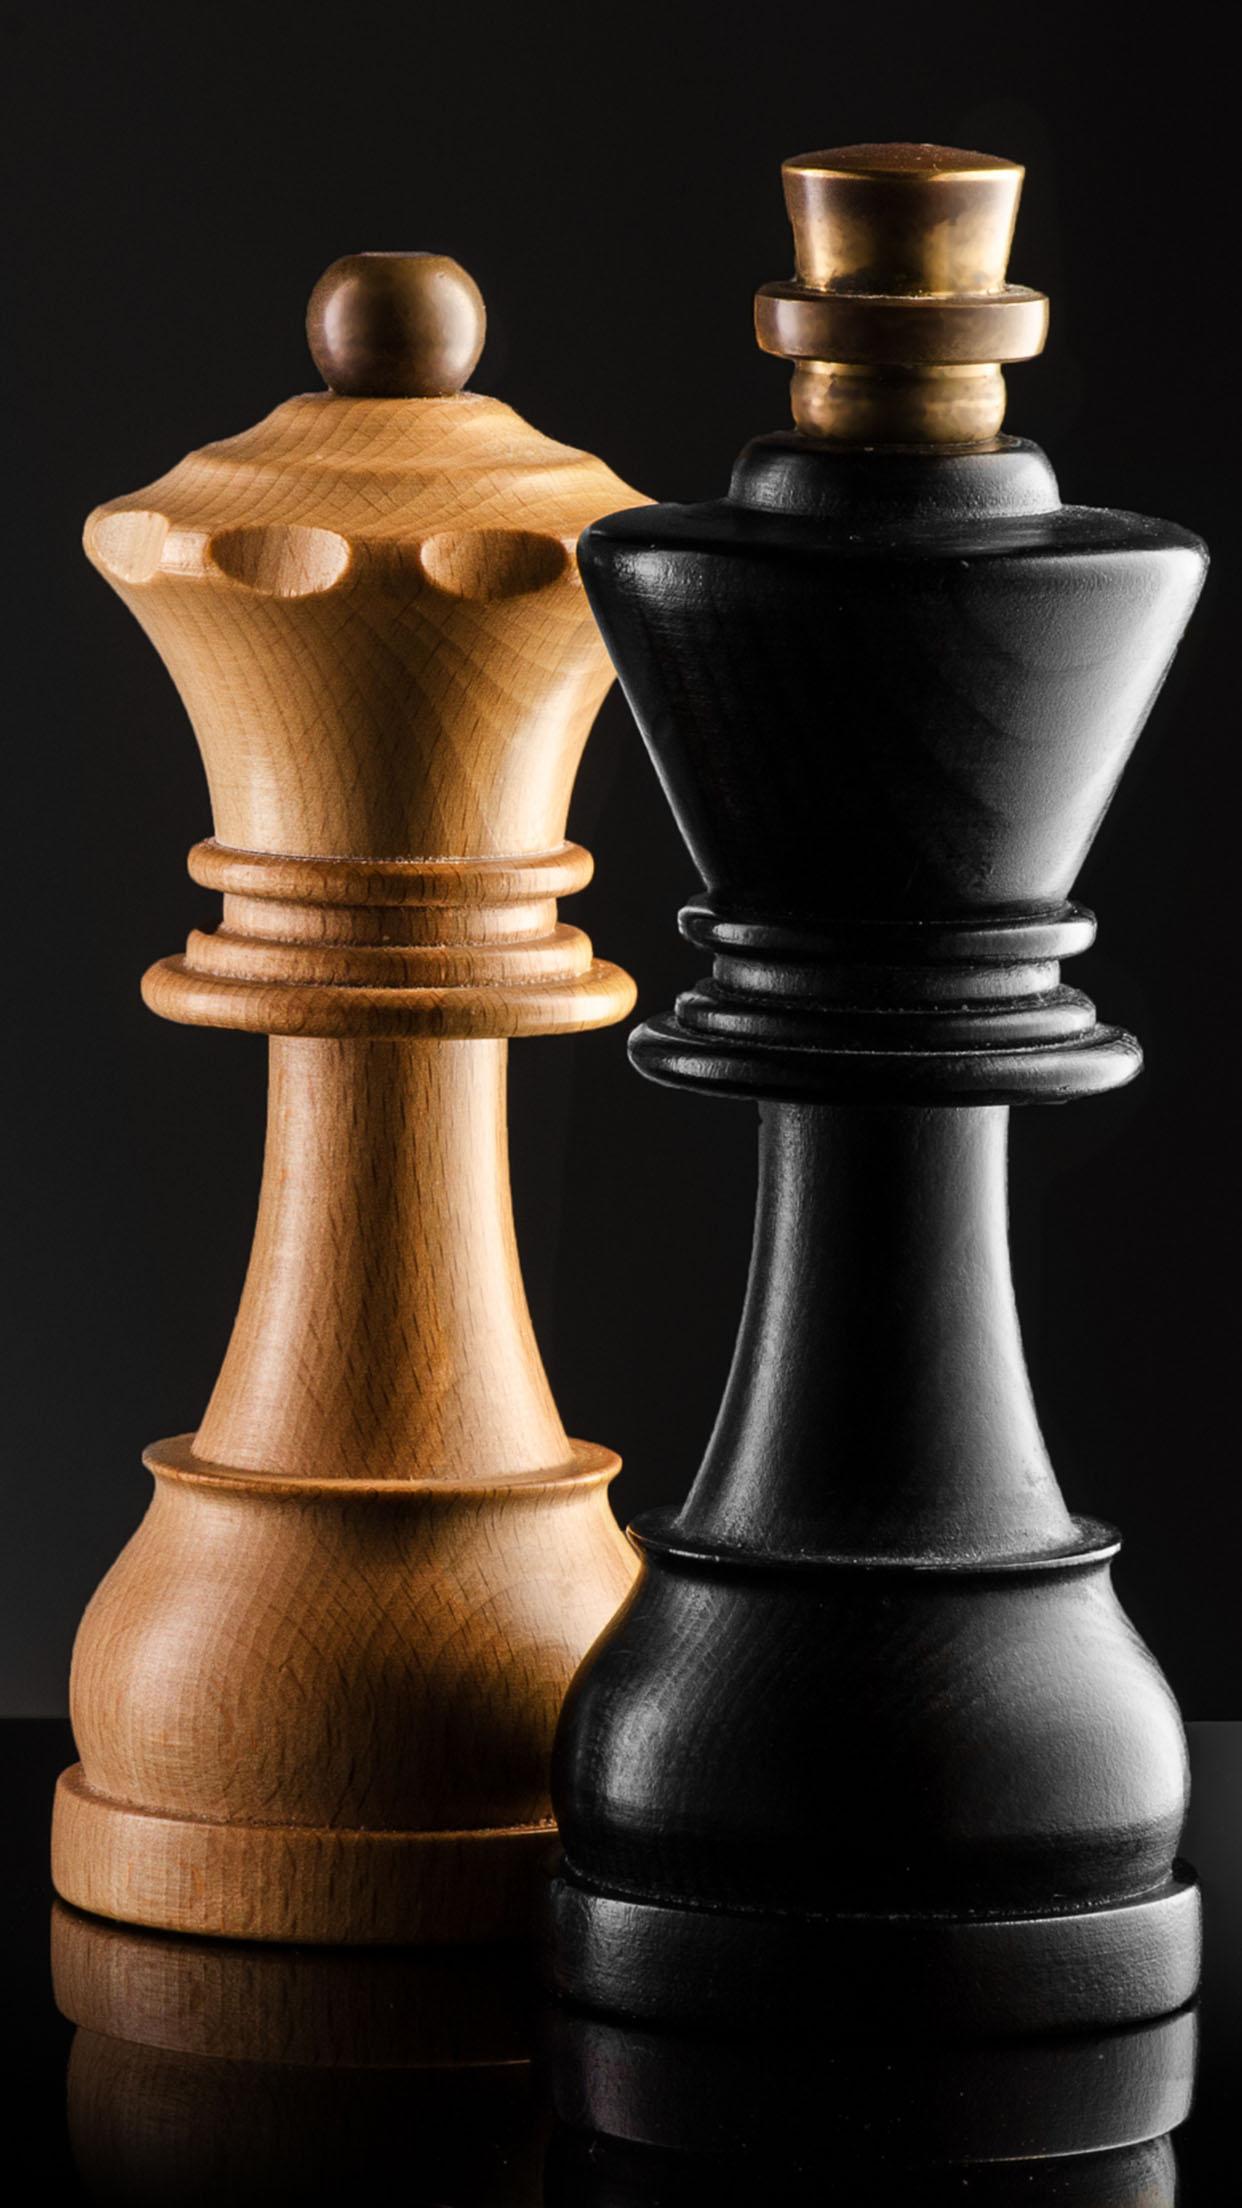 Chess Chess 1 3Wallpapers iPhone Parallax 3Wallpapers : notre sélection de fonds d'écran du 23/11/2016